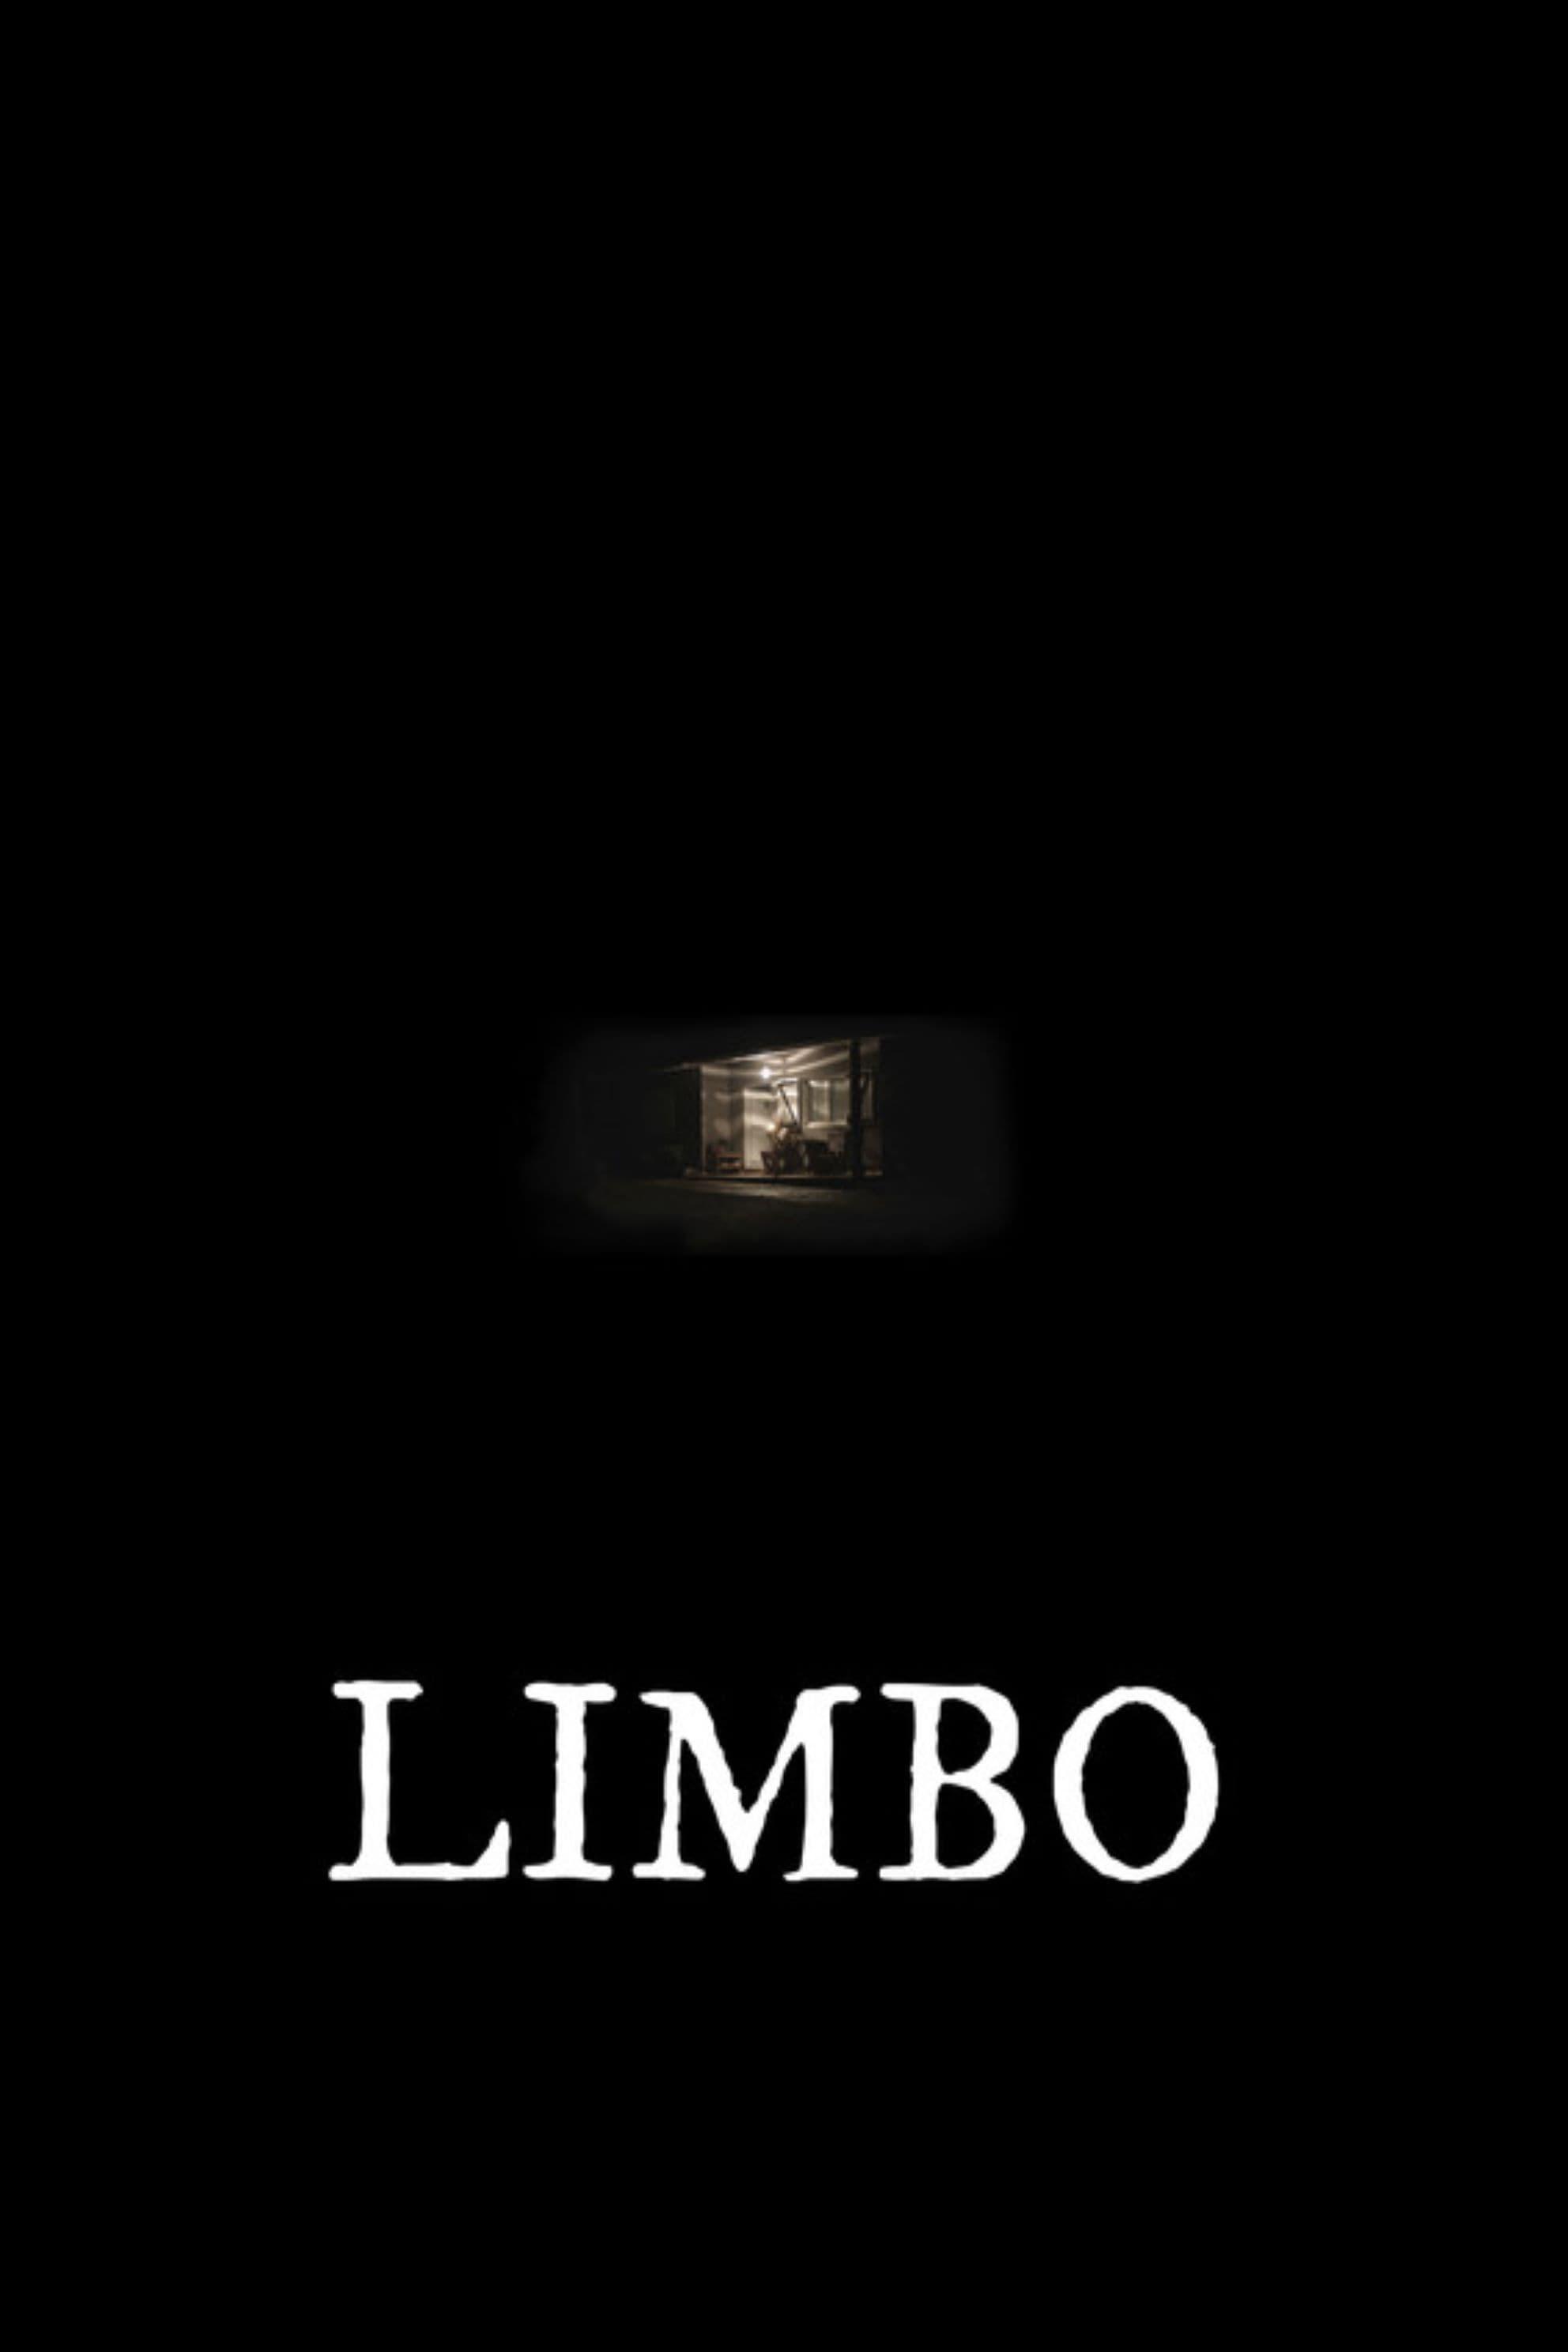 Limbo (2018)